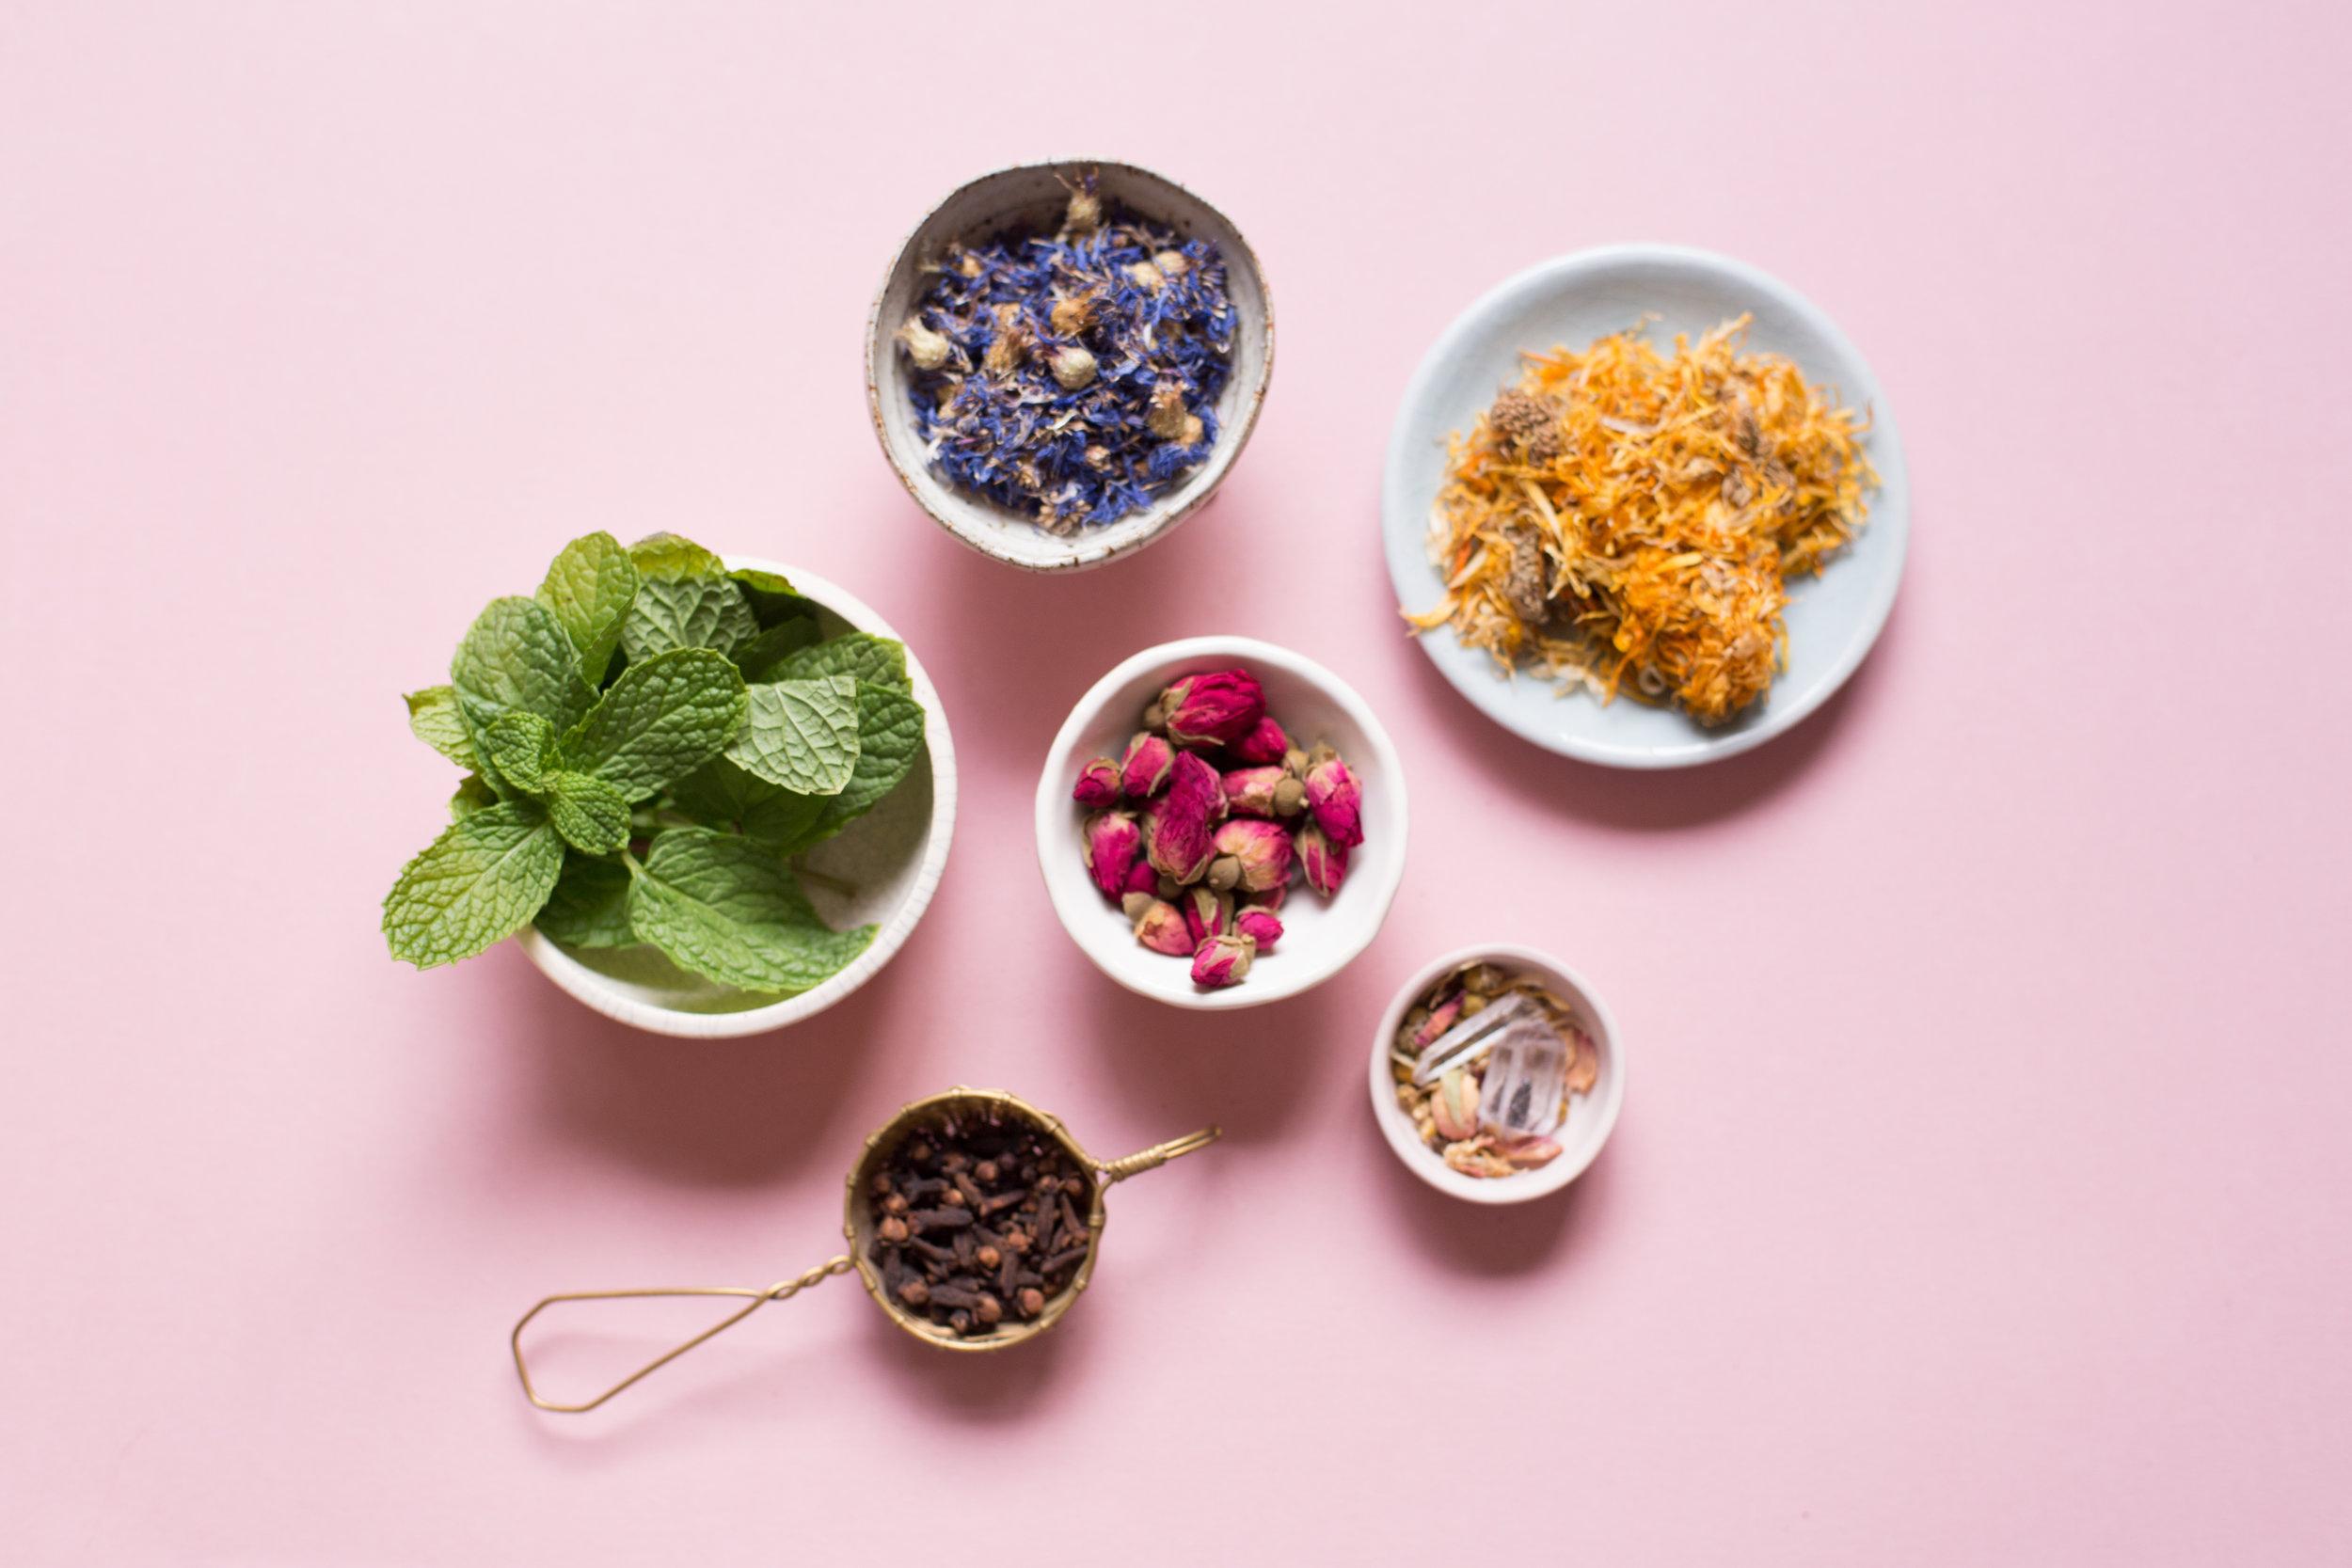 Herbs-and-plants.jpg